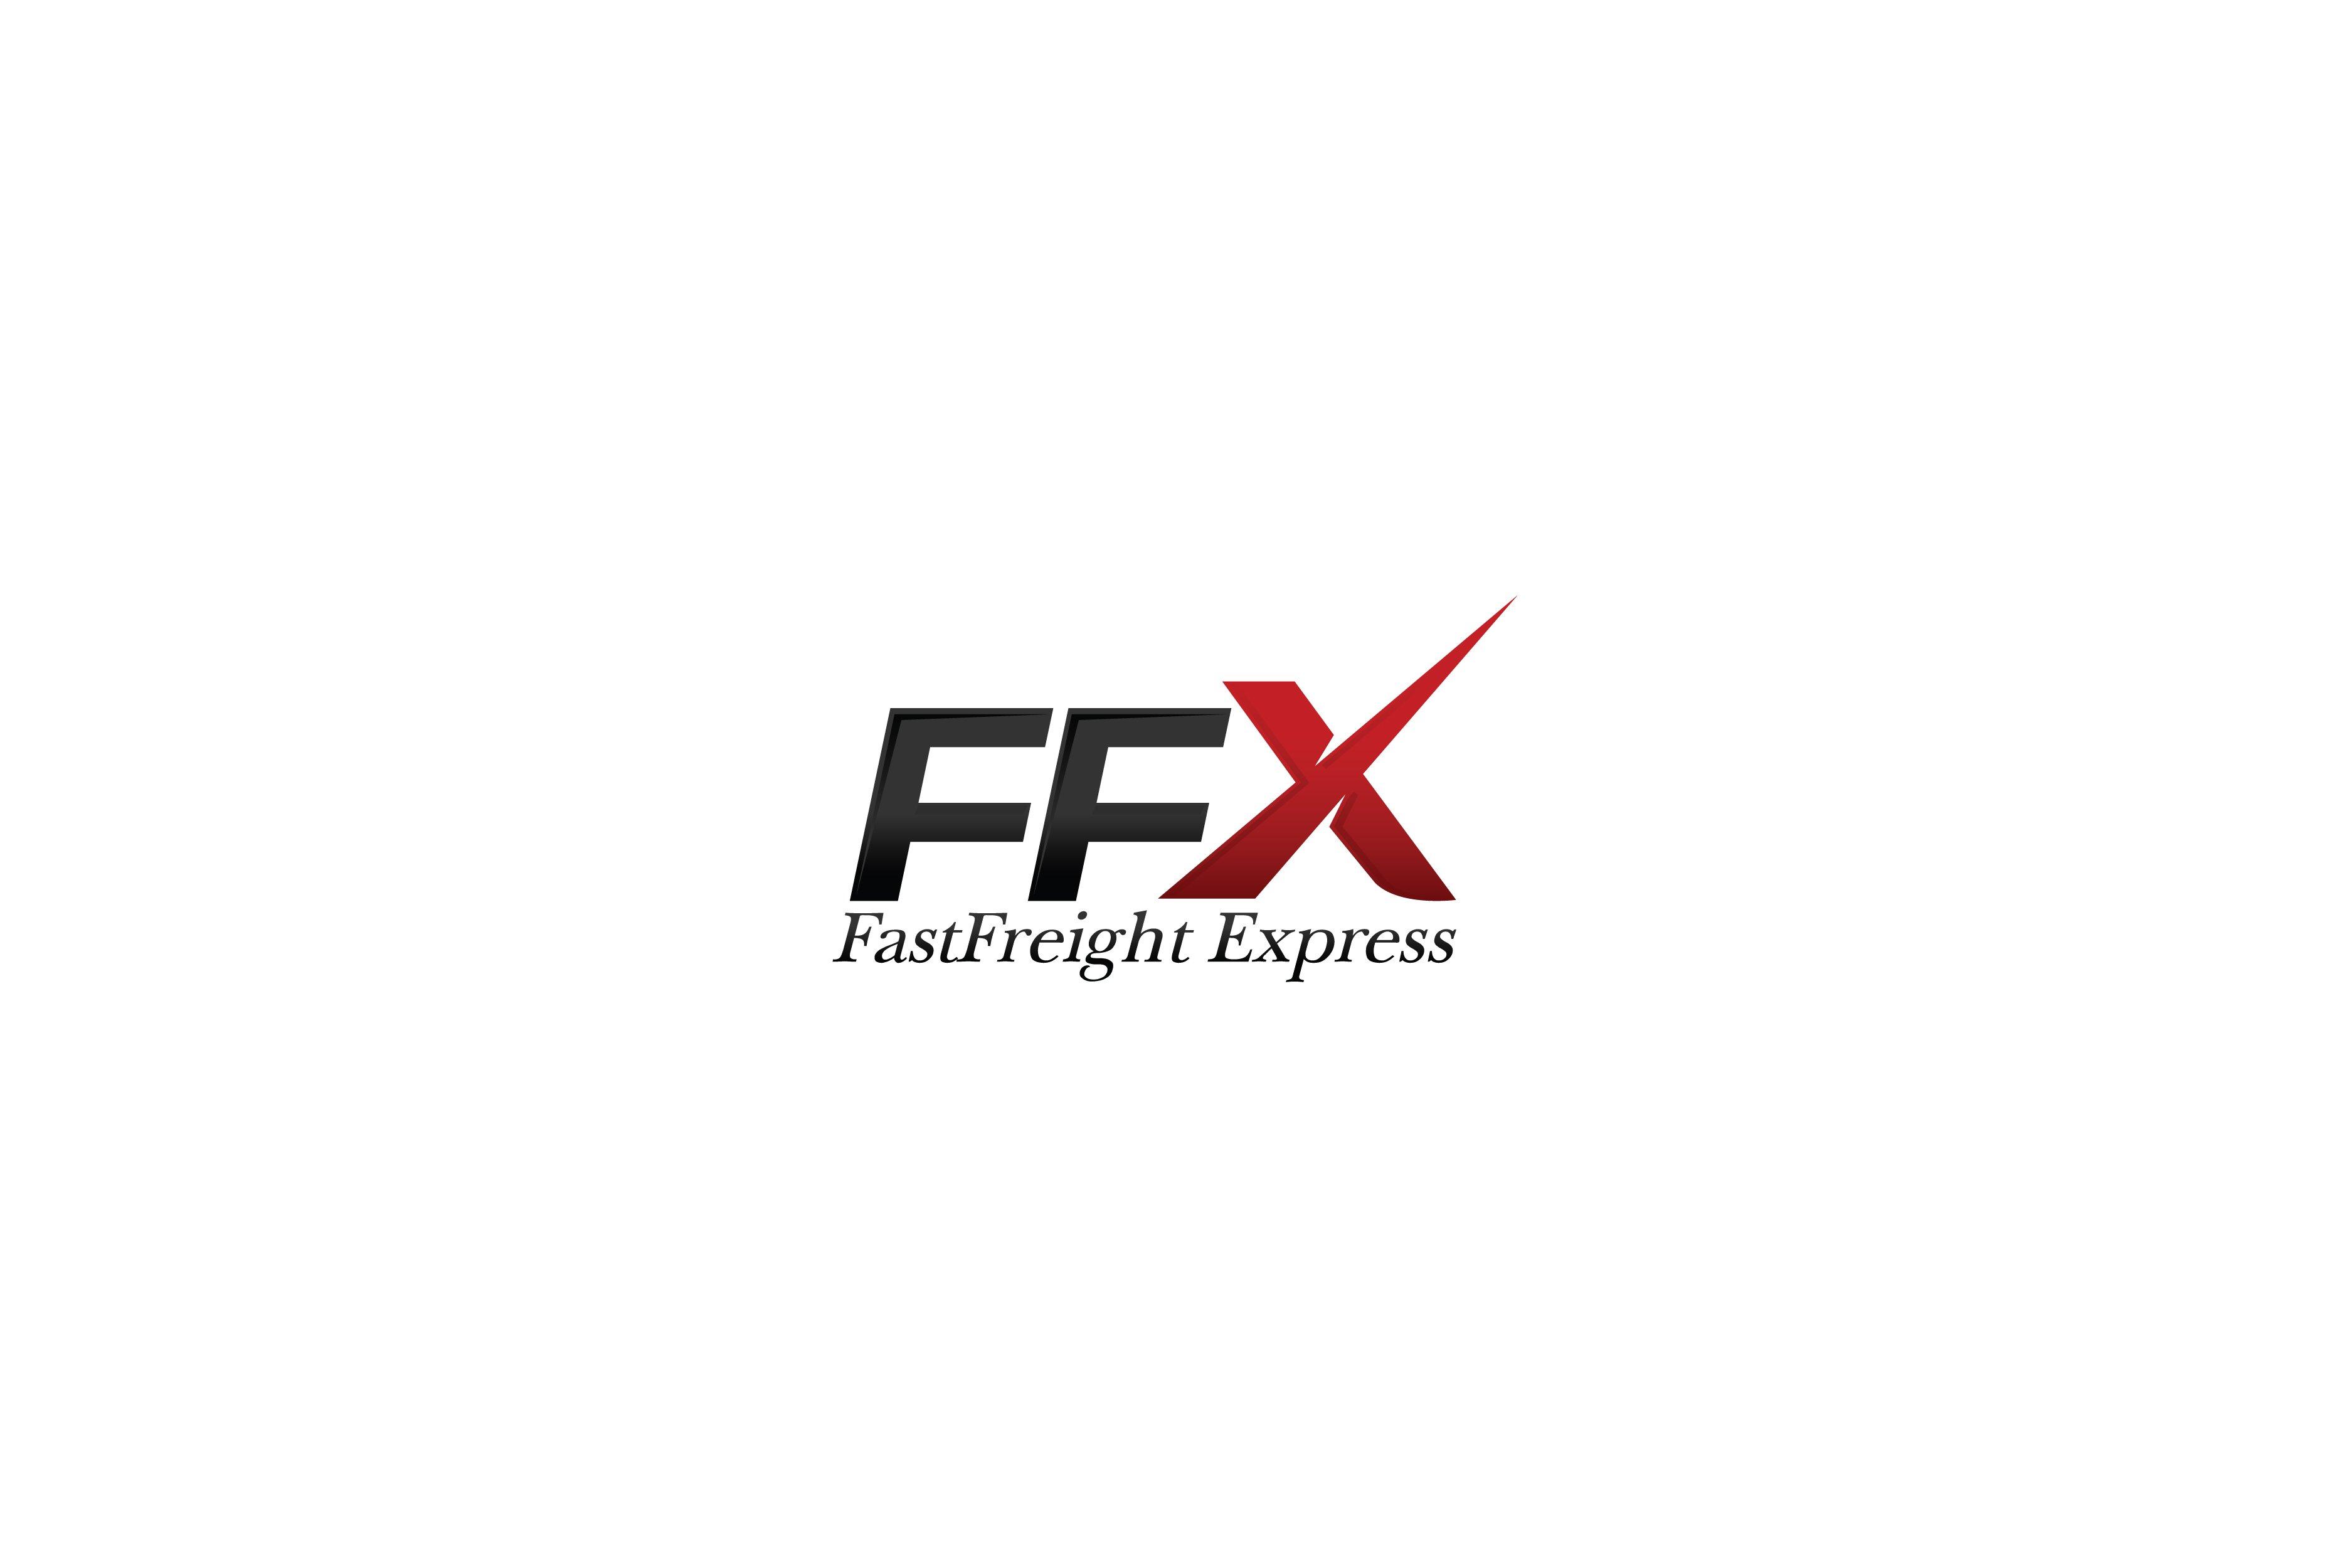 FastFreight Express